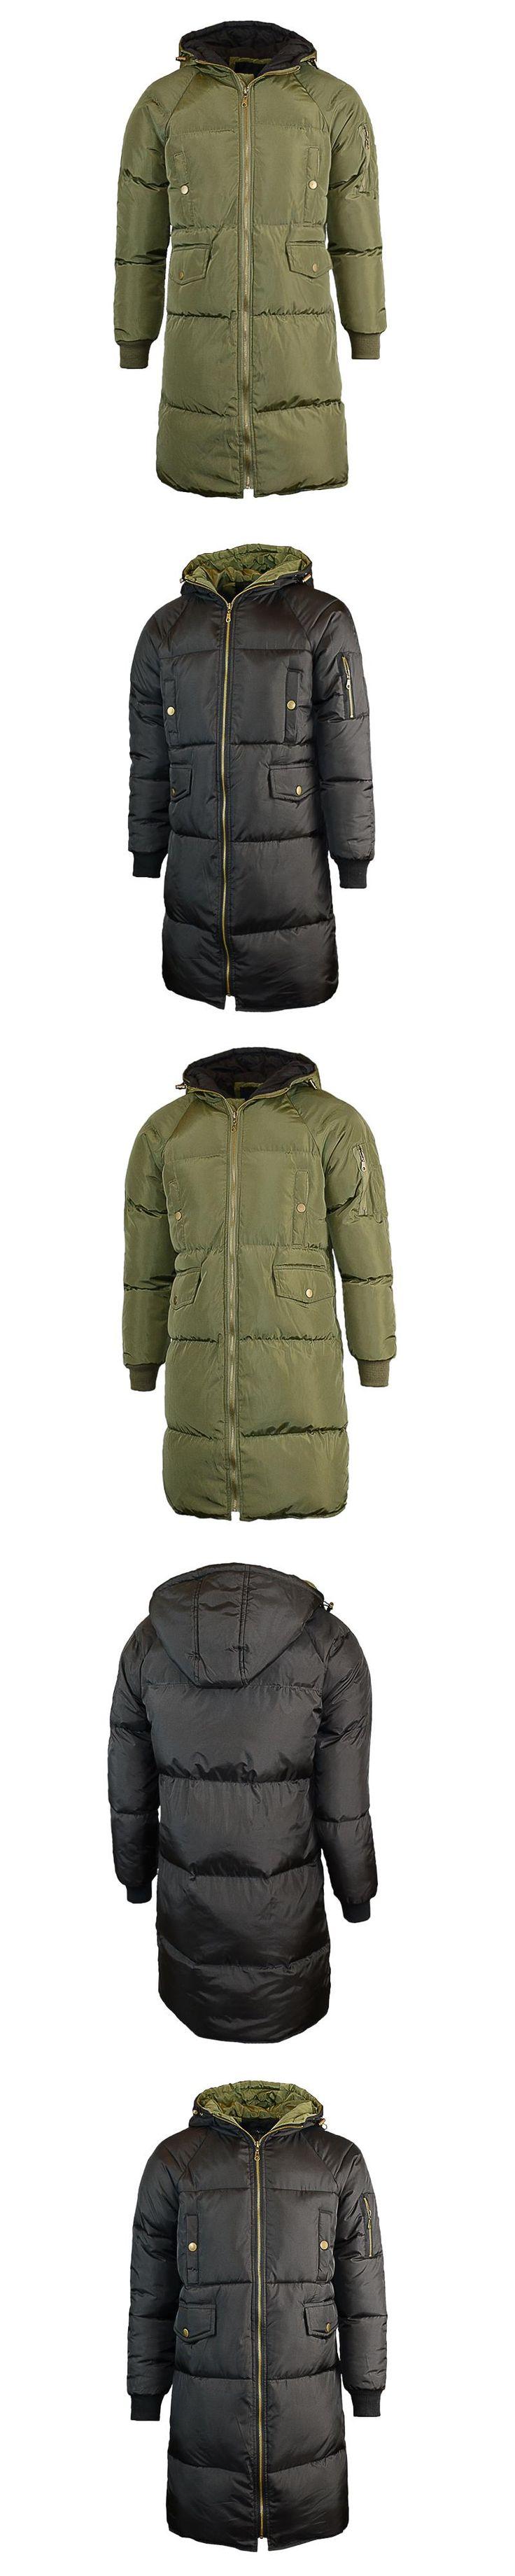 Winter Jacket Men 2017 Fashion High Quality Men's Hooded Long Hooded Trench Coat Jacket Slim Fit Winter Warm Parka Men Outwear